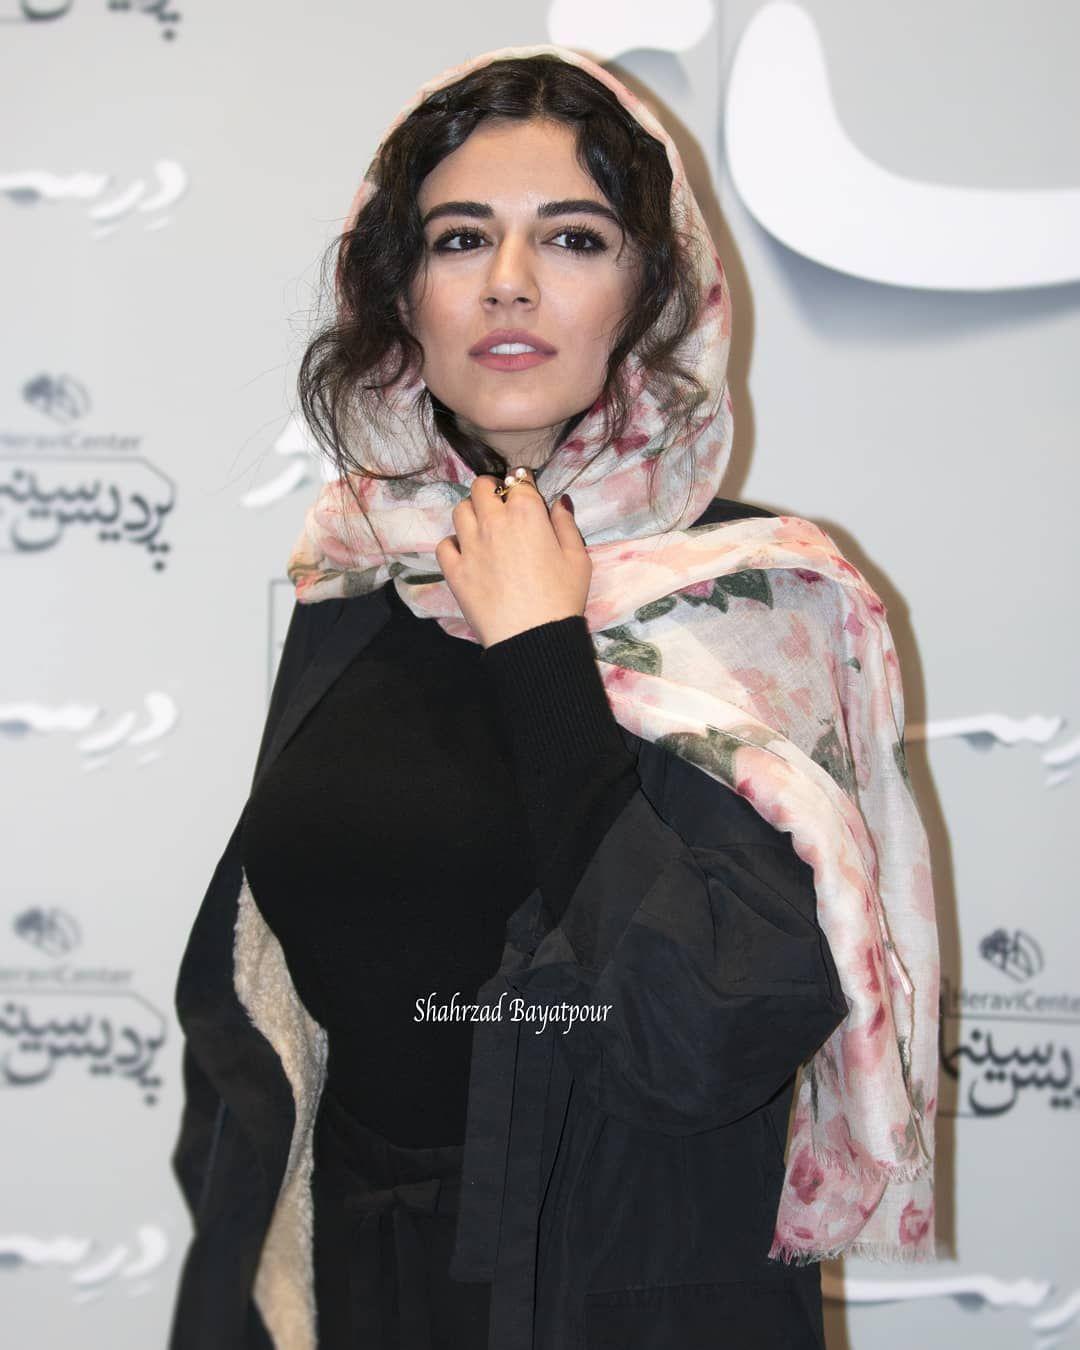 32 6k Likes 572 Comments ماهی الوند Mahoor Alvand On Instagram Shahrzad Bayatpour Fashion High Neck Dress Neck Dress